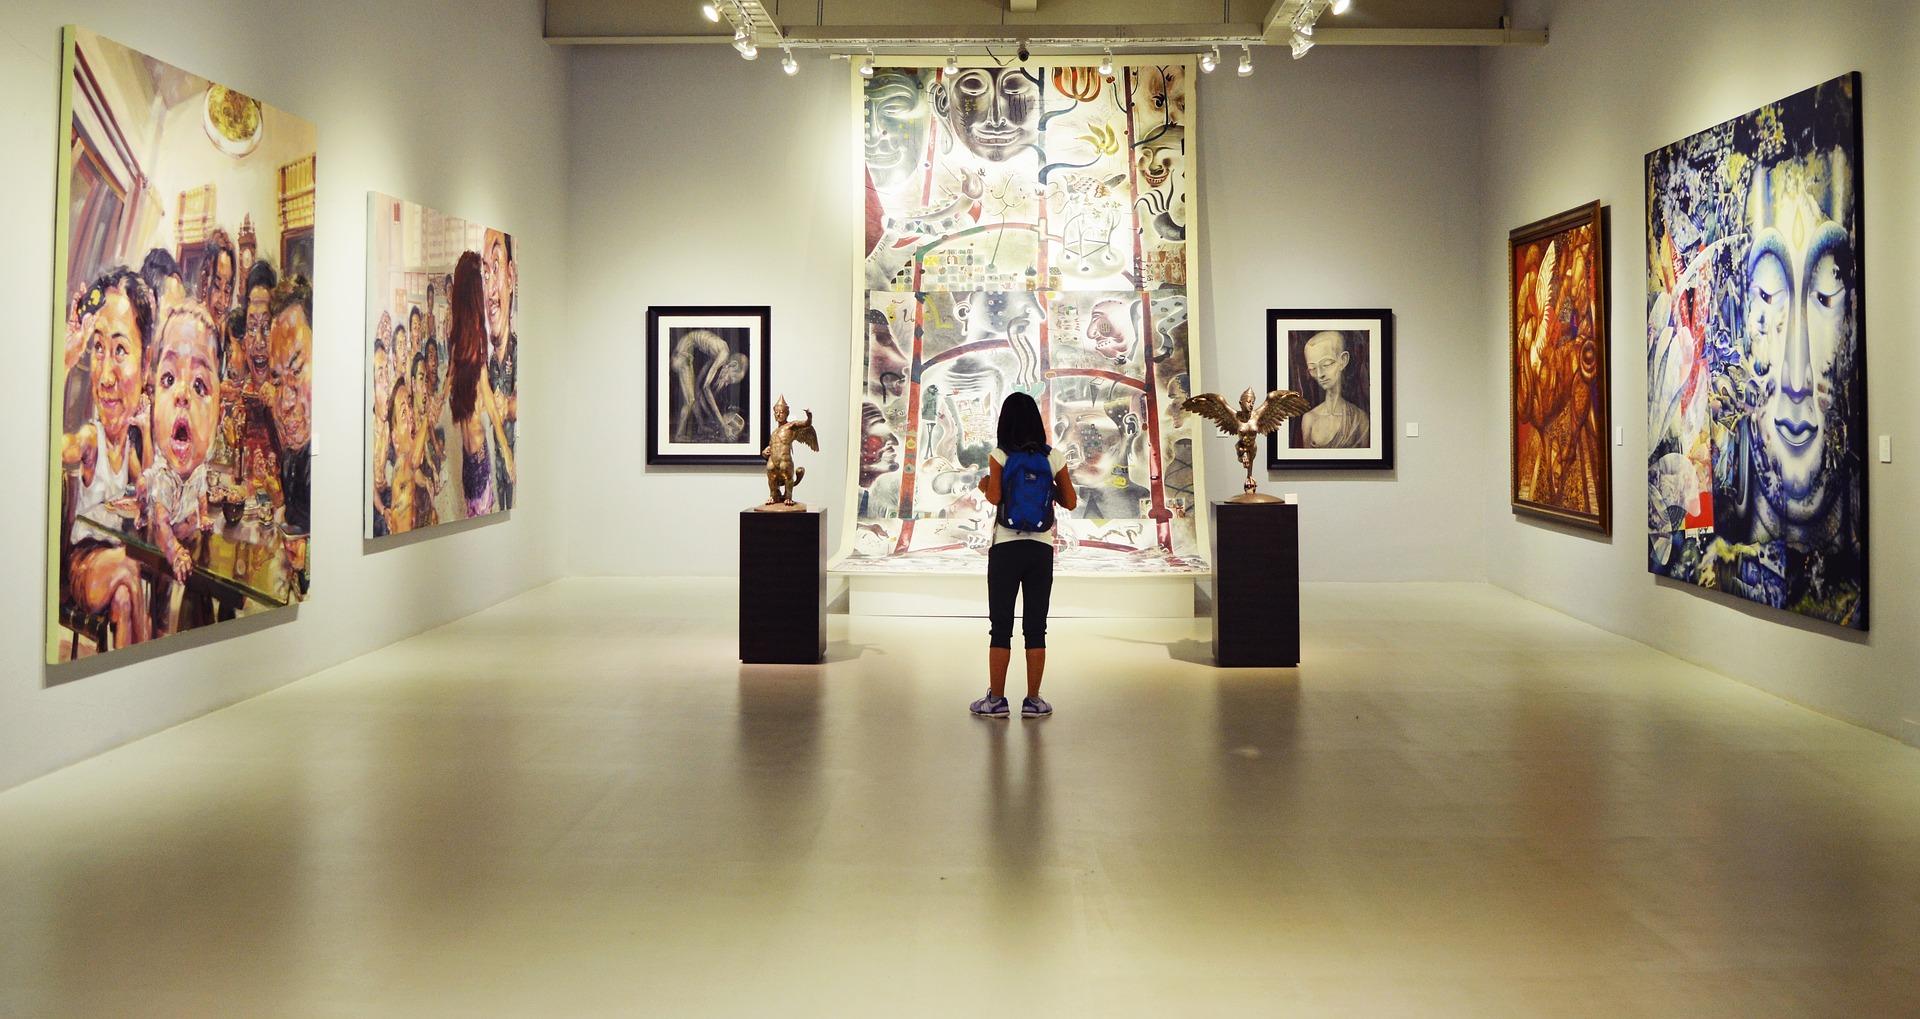 Vendor/Art Showcase